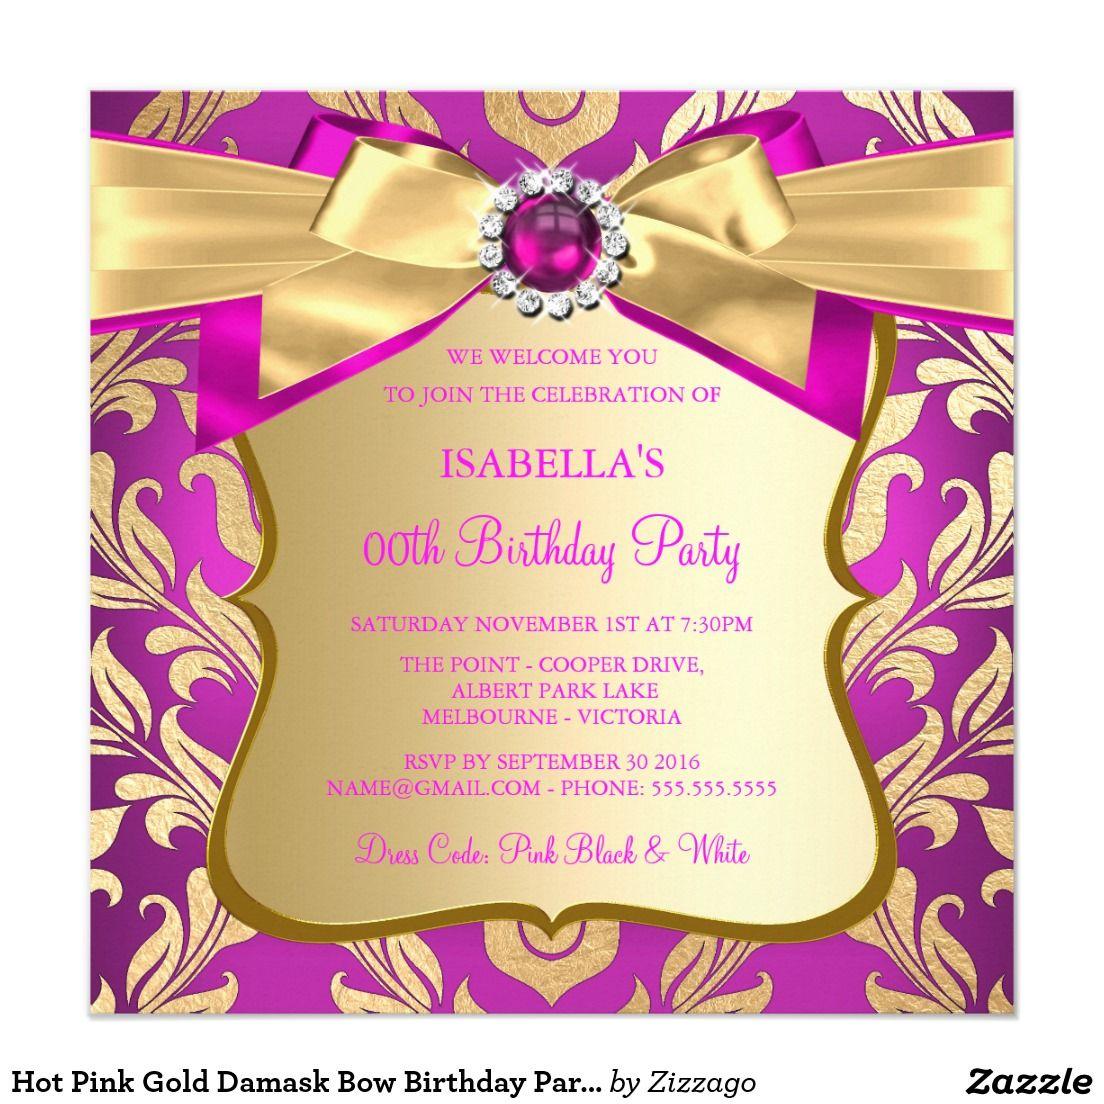 Hot Pink Gold Damask Bow Birthday Party Invite 2 | Birthdays, Girl ...